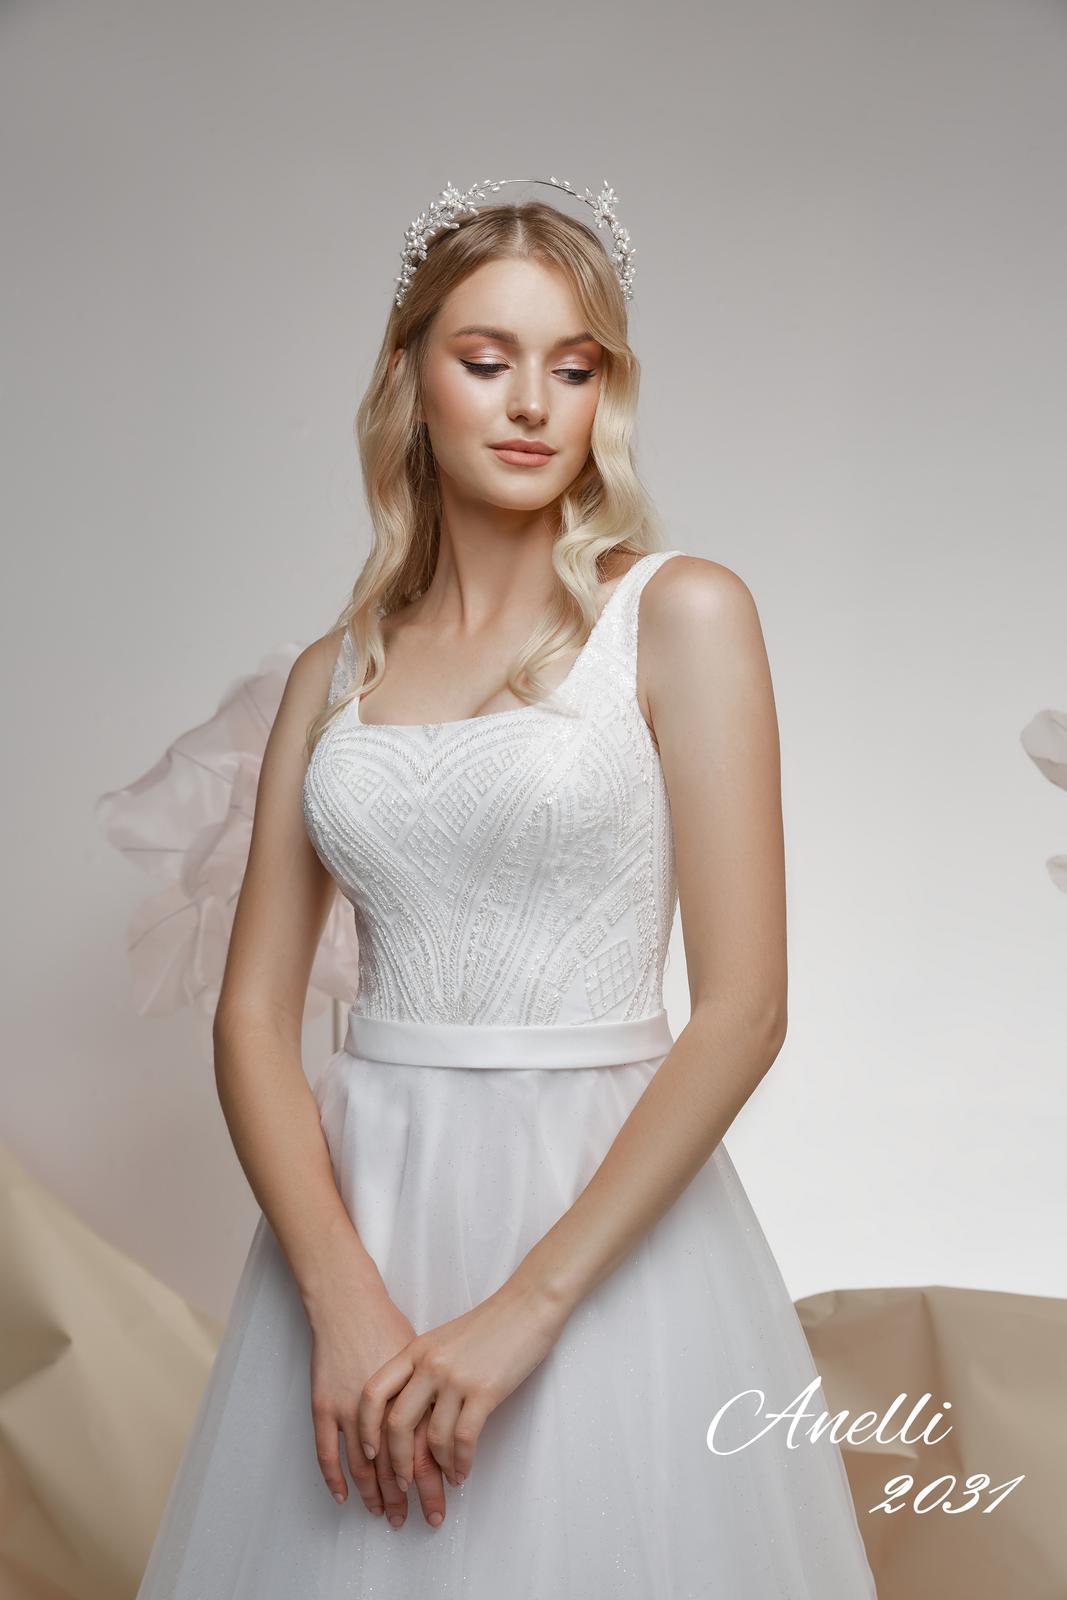 Svadobné šaty - Imagine 2031 - Obrázok č. 3